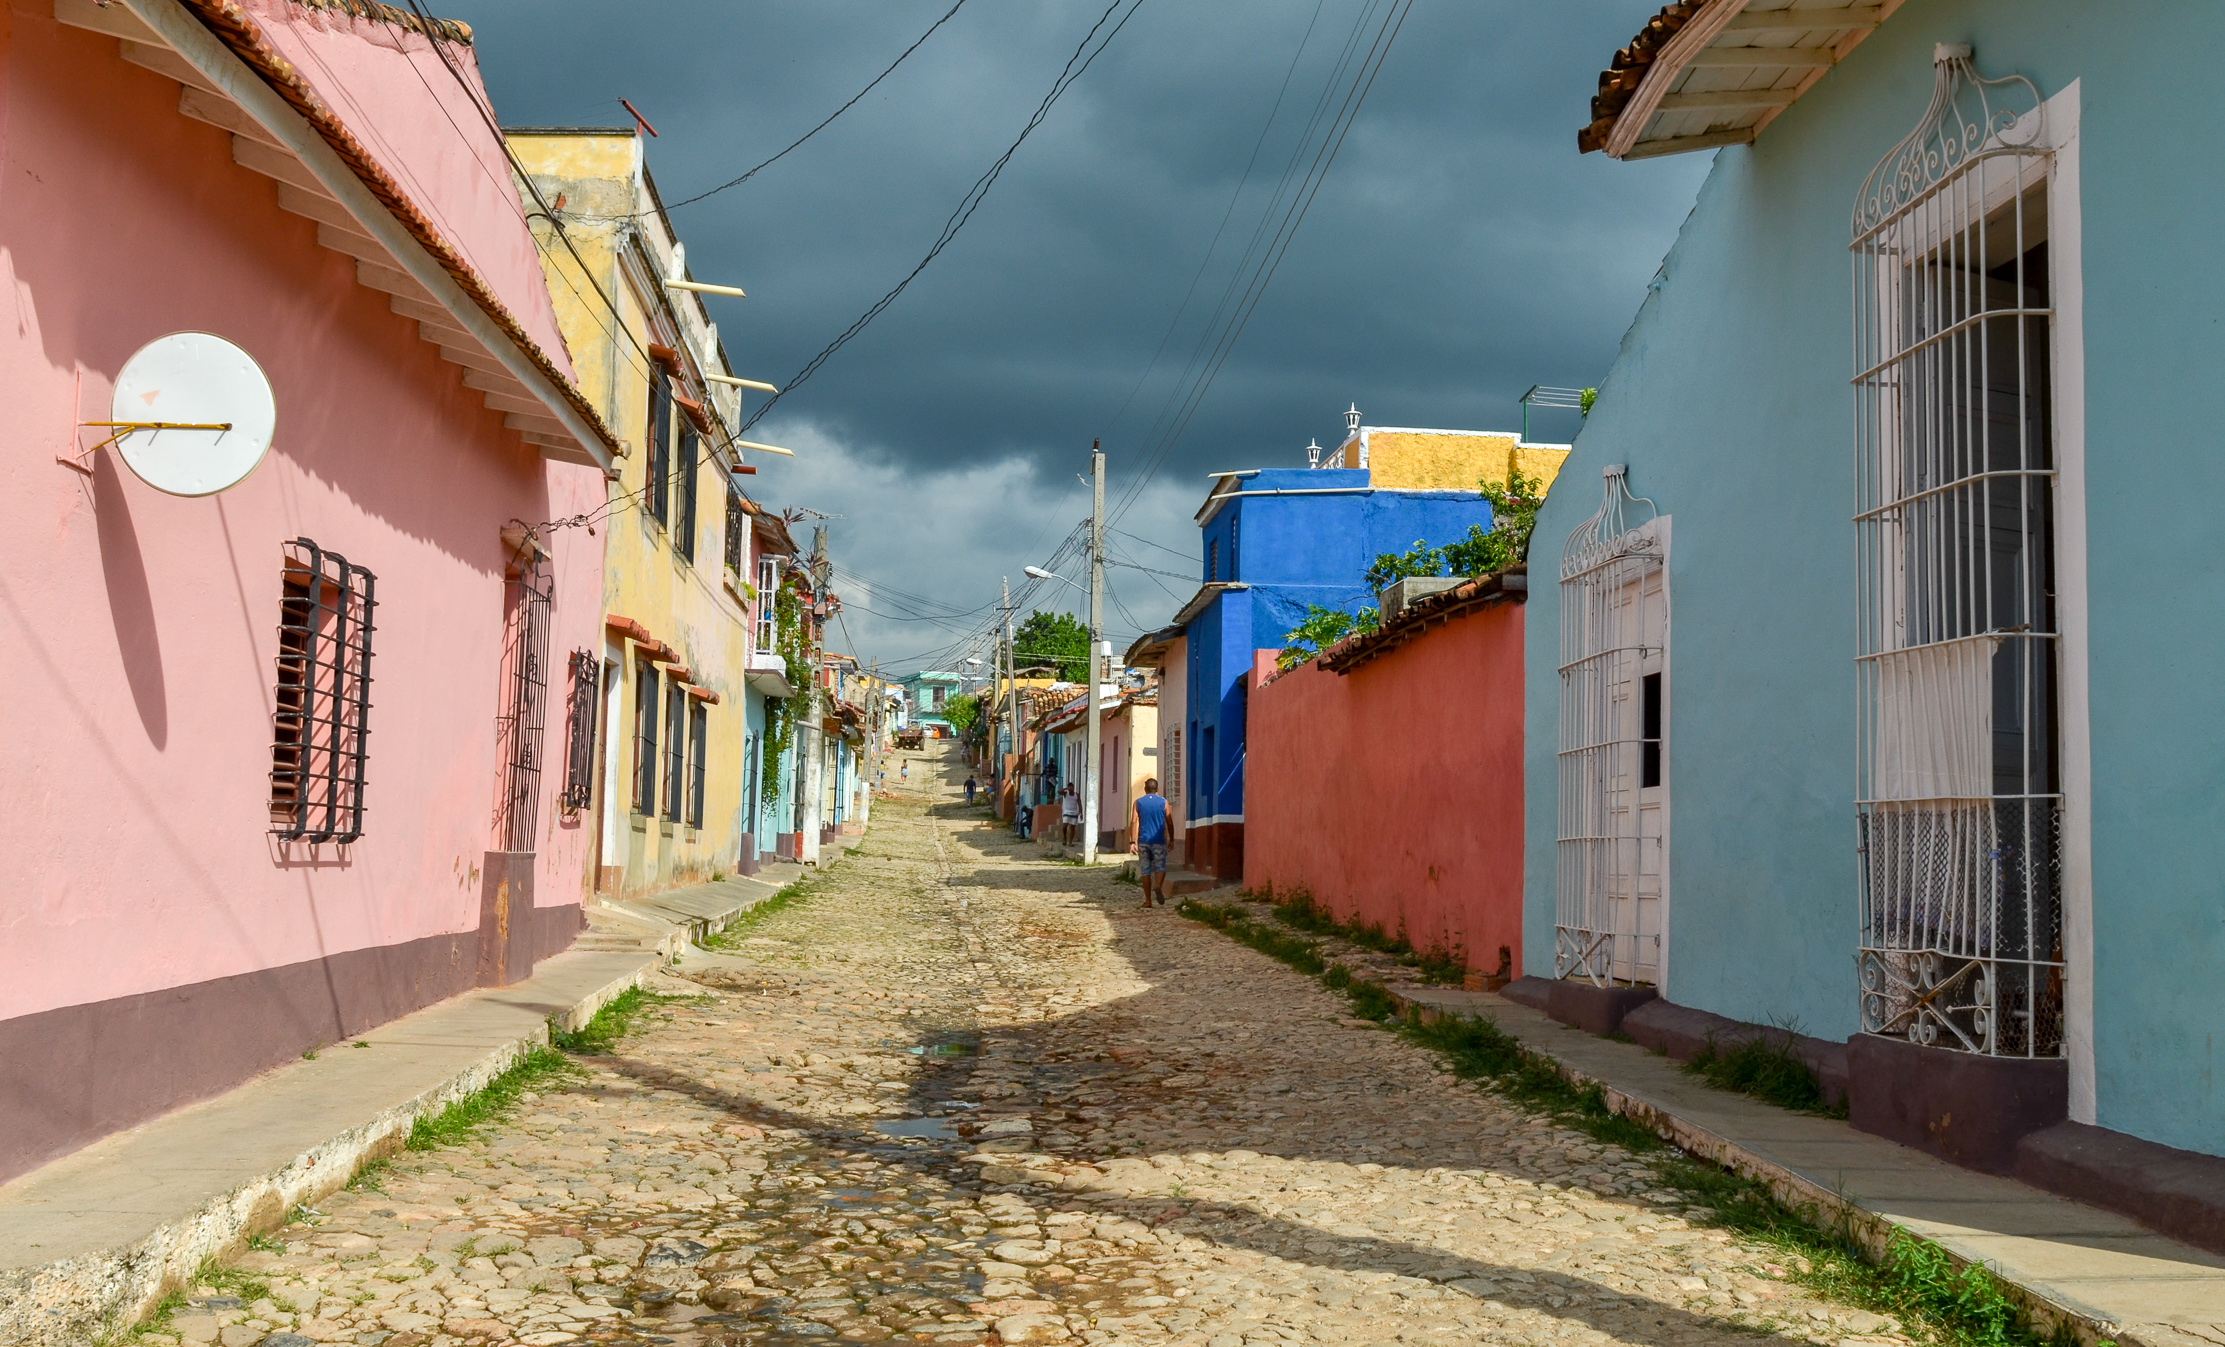 Street in Trinidad Cuba 2015